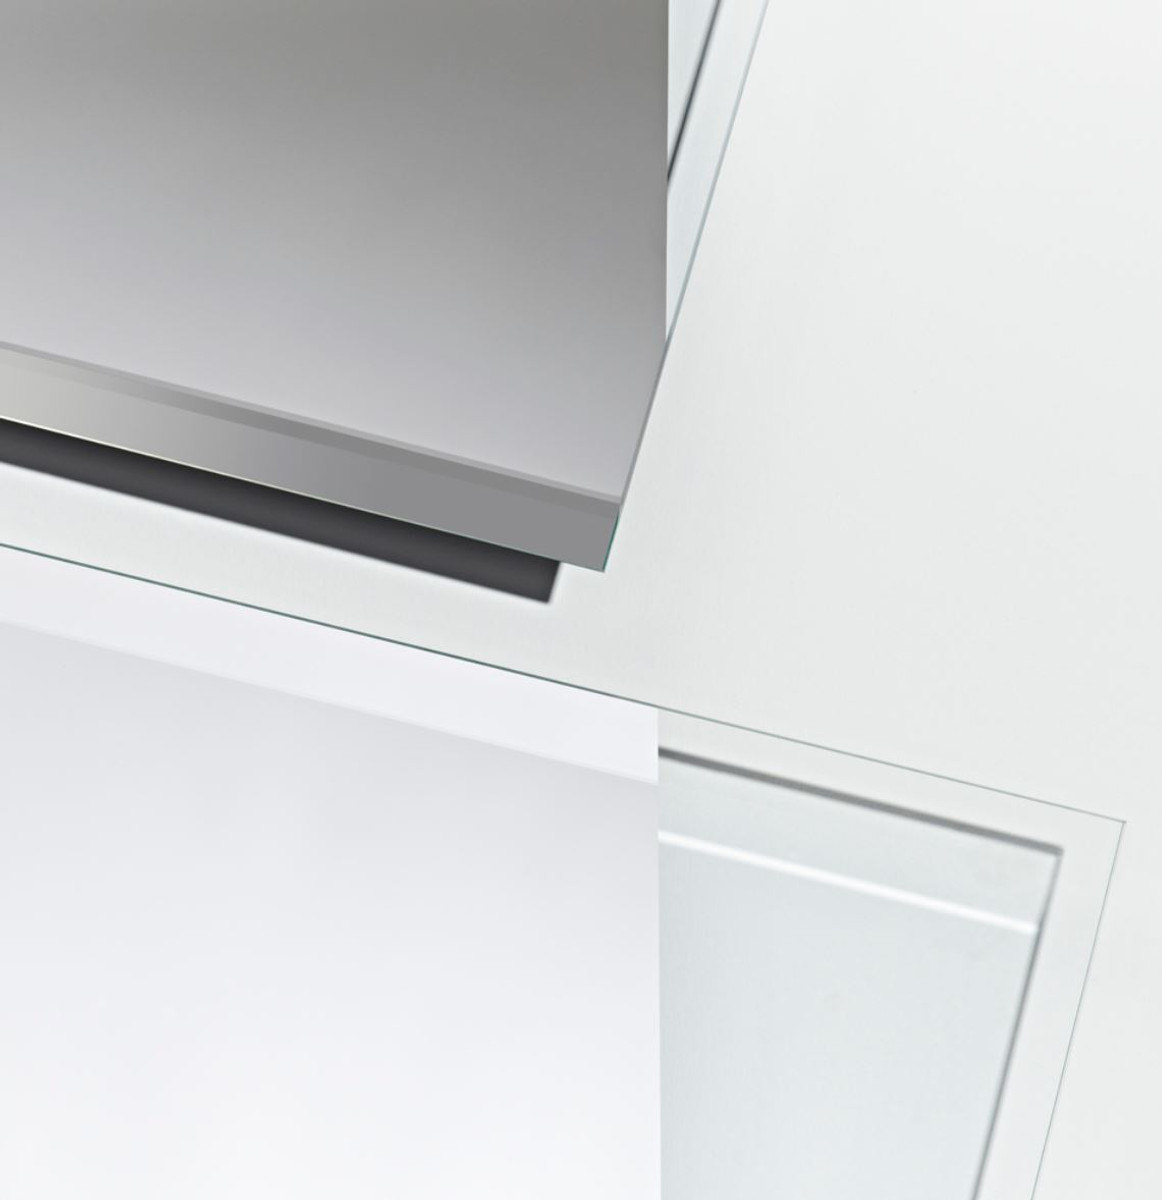 casa padrino designer wandspiegel 50 x h 160 cm designerm bel spiegel luxus spiegel luxus. Black Bedroom Furniture Sets. Home Design Ideas